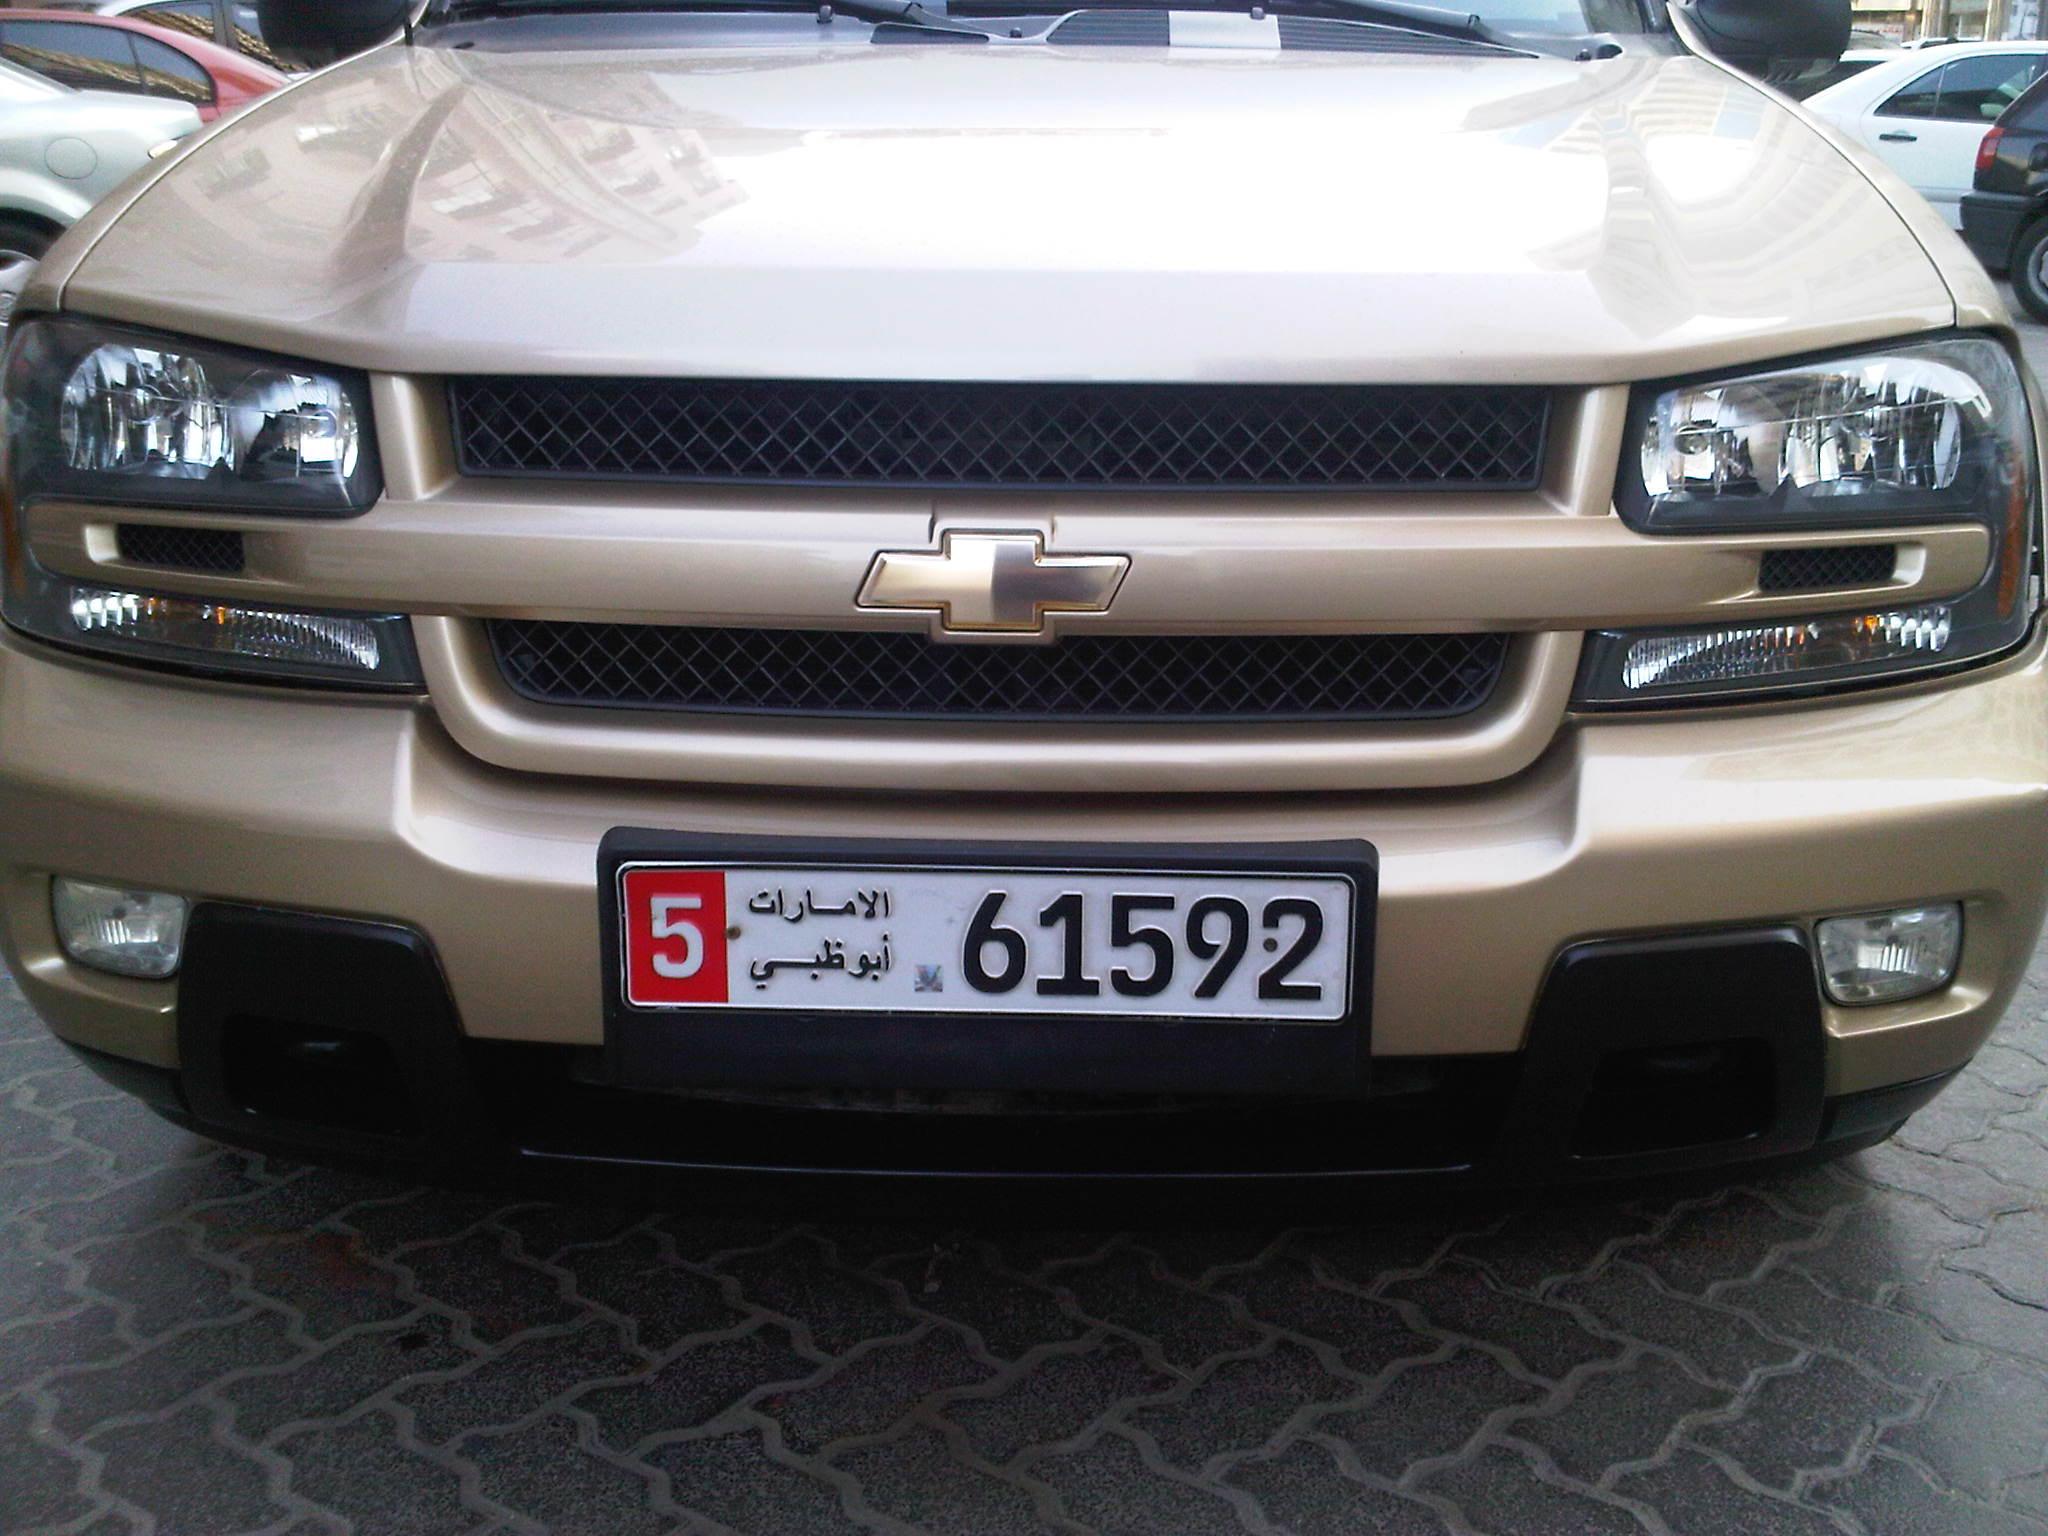 Chevrolet GM OEM 02-05 Trailblazer Front Bumper-Spacer Support Bracket 12335948